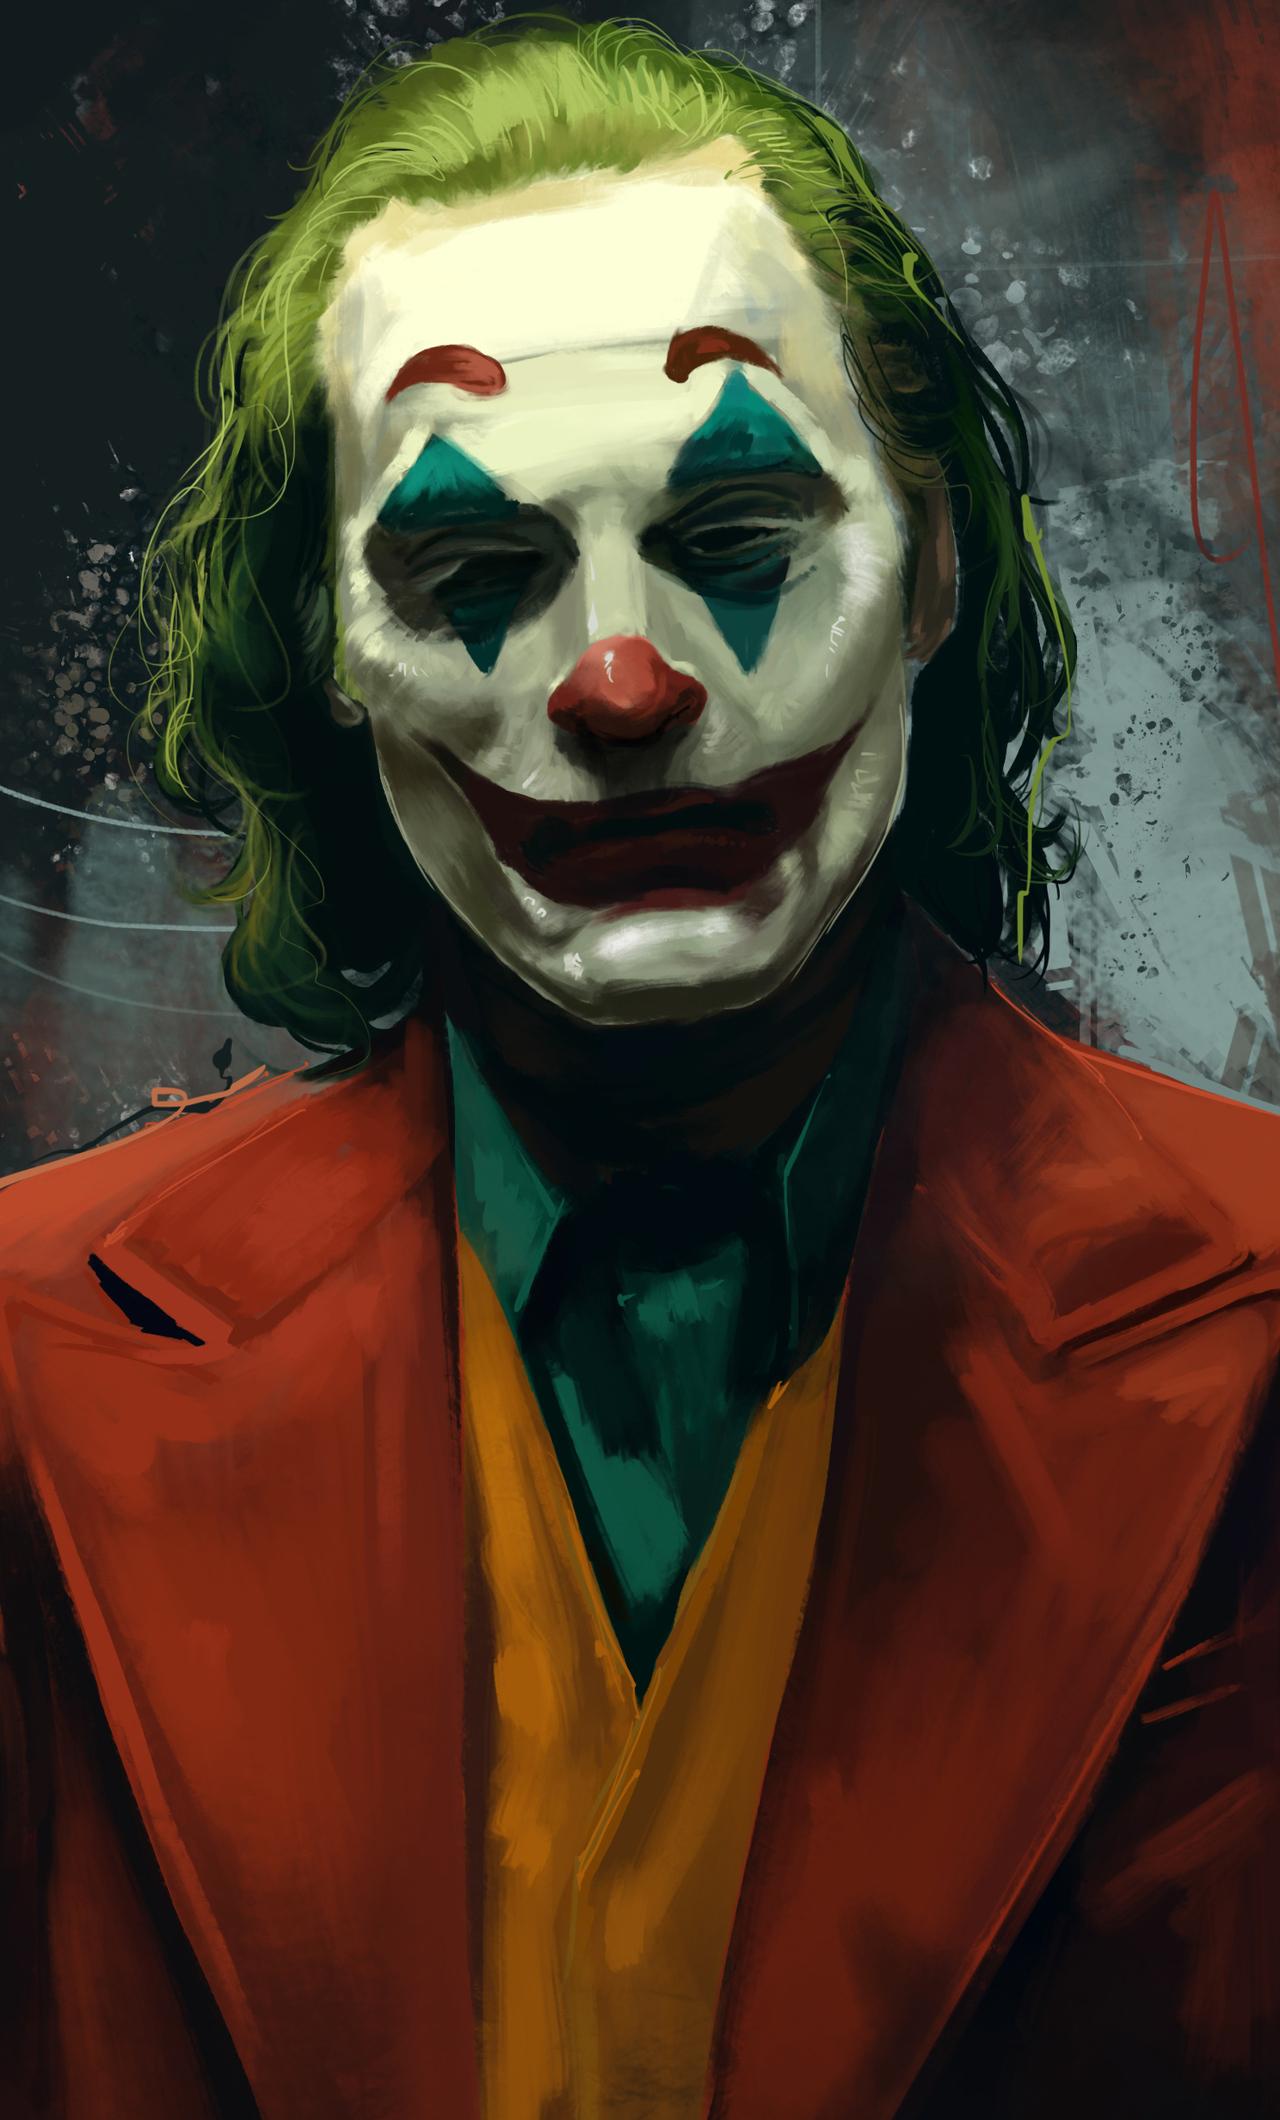 1280x2120 Joker Joaquin Phoenix Movie Artwork Iphone 6 Hd